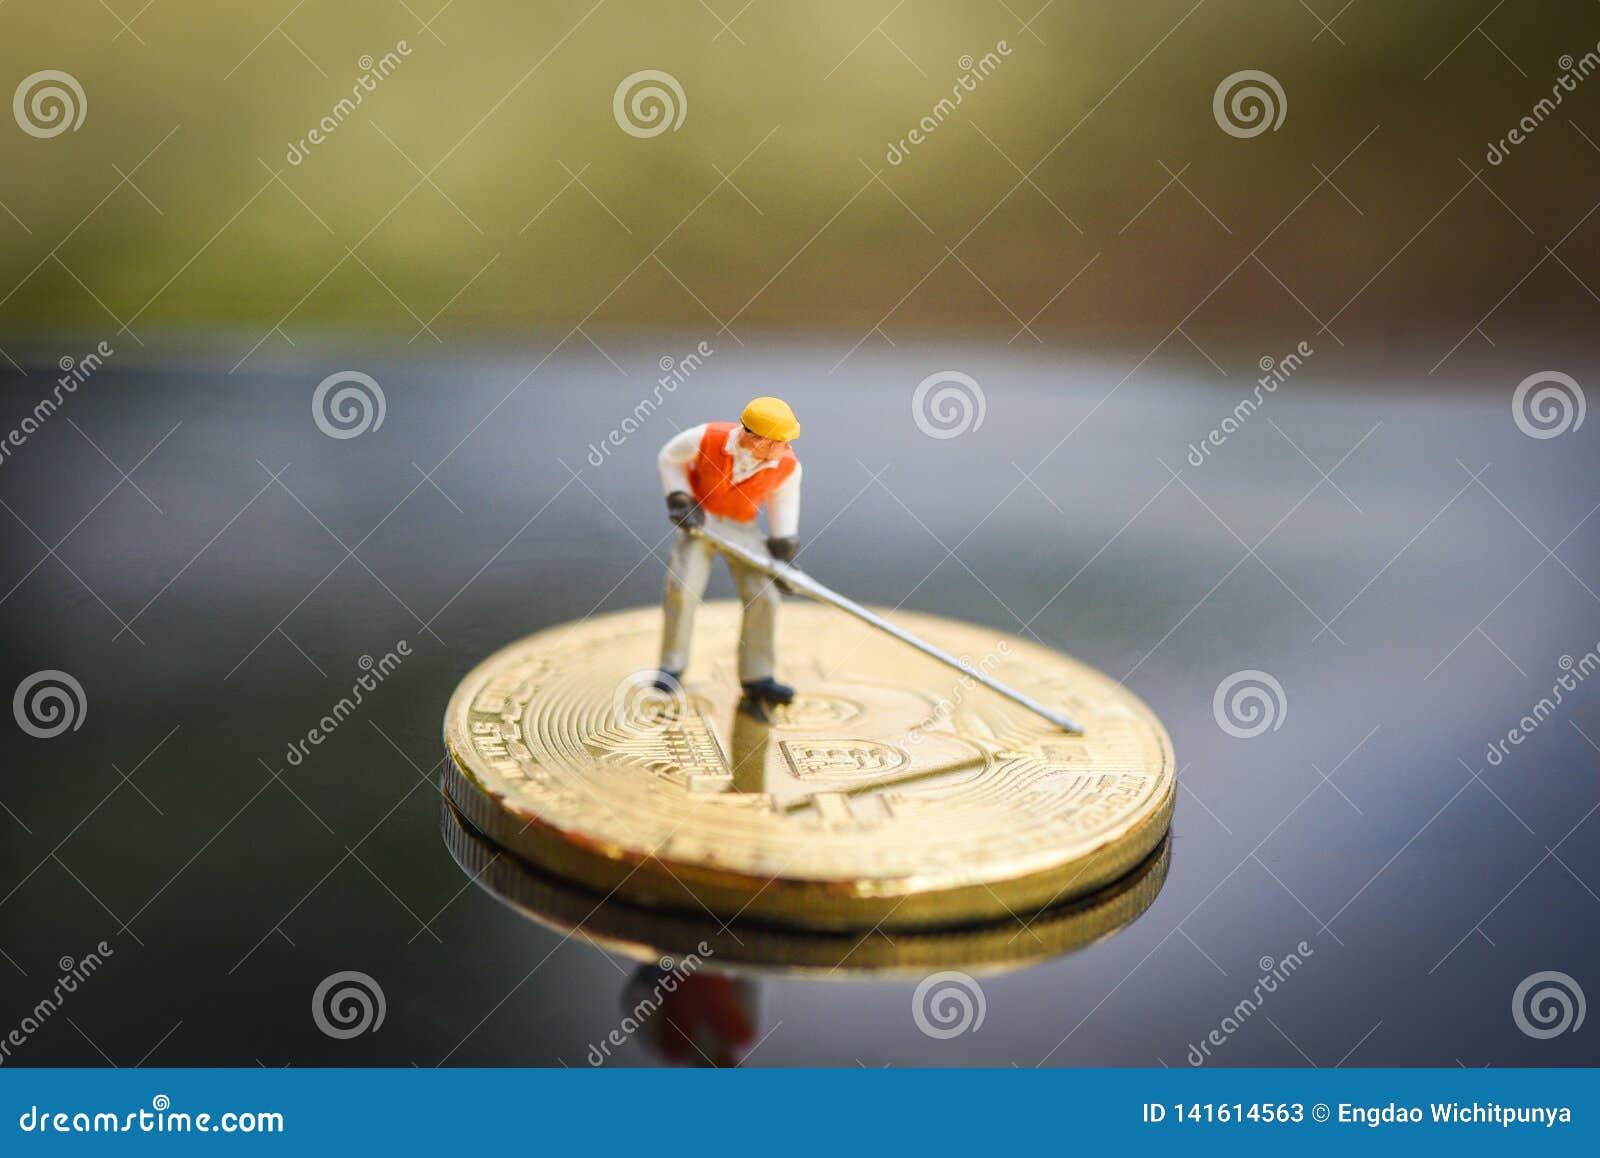 Statyetter som arbetar bryta Bitcoin guld- gräva faktisk cryptocurrencybitcoin som bryter begrepp